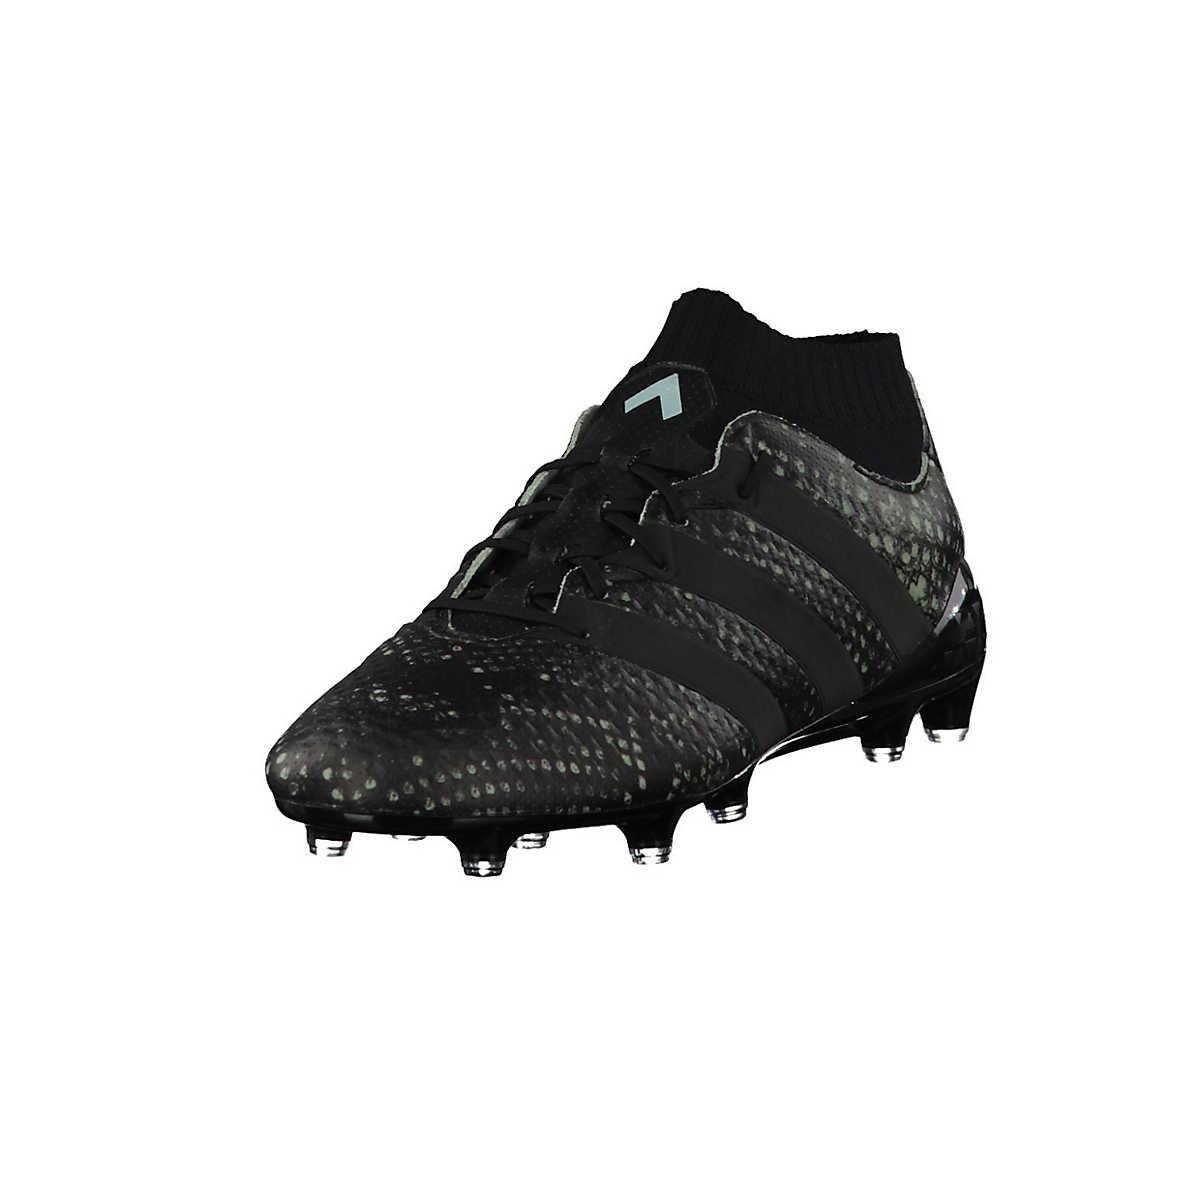 adidas Sportschuhe schwarz - adidas - Sportschuhe - Schuhe - mirapodo.de